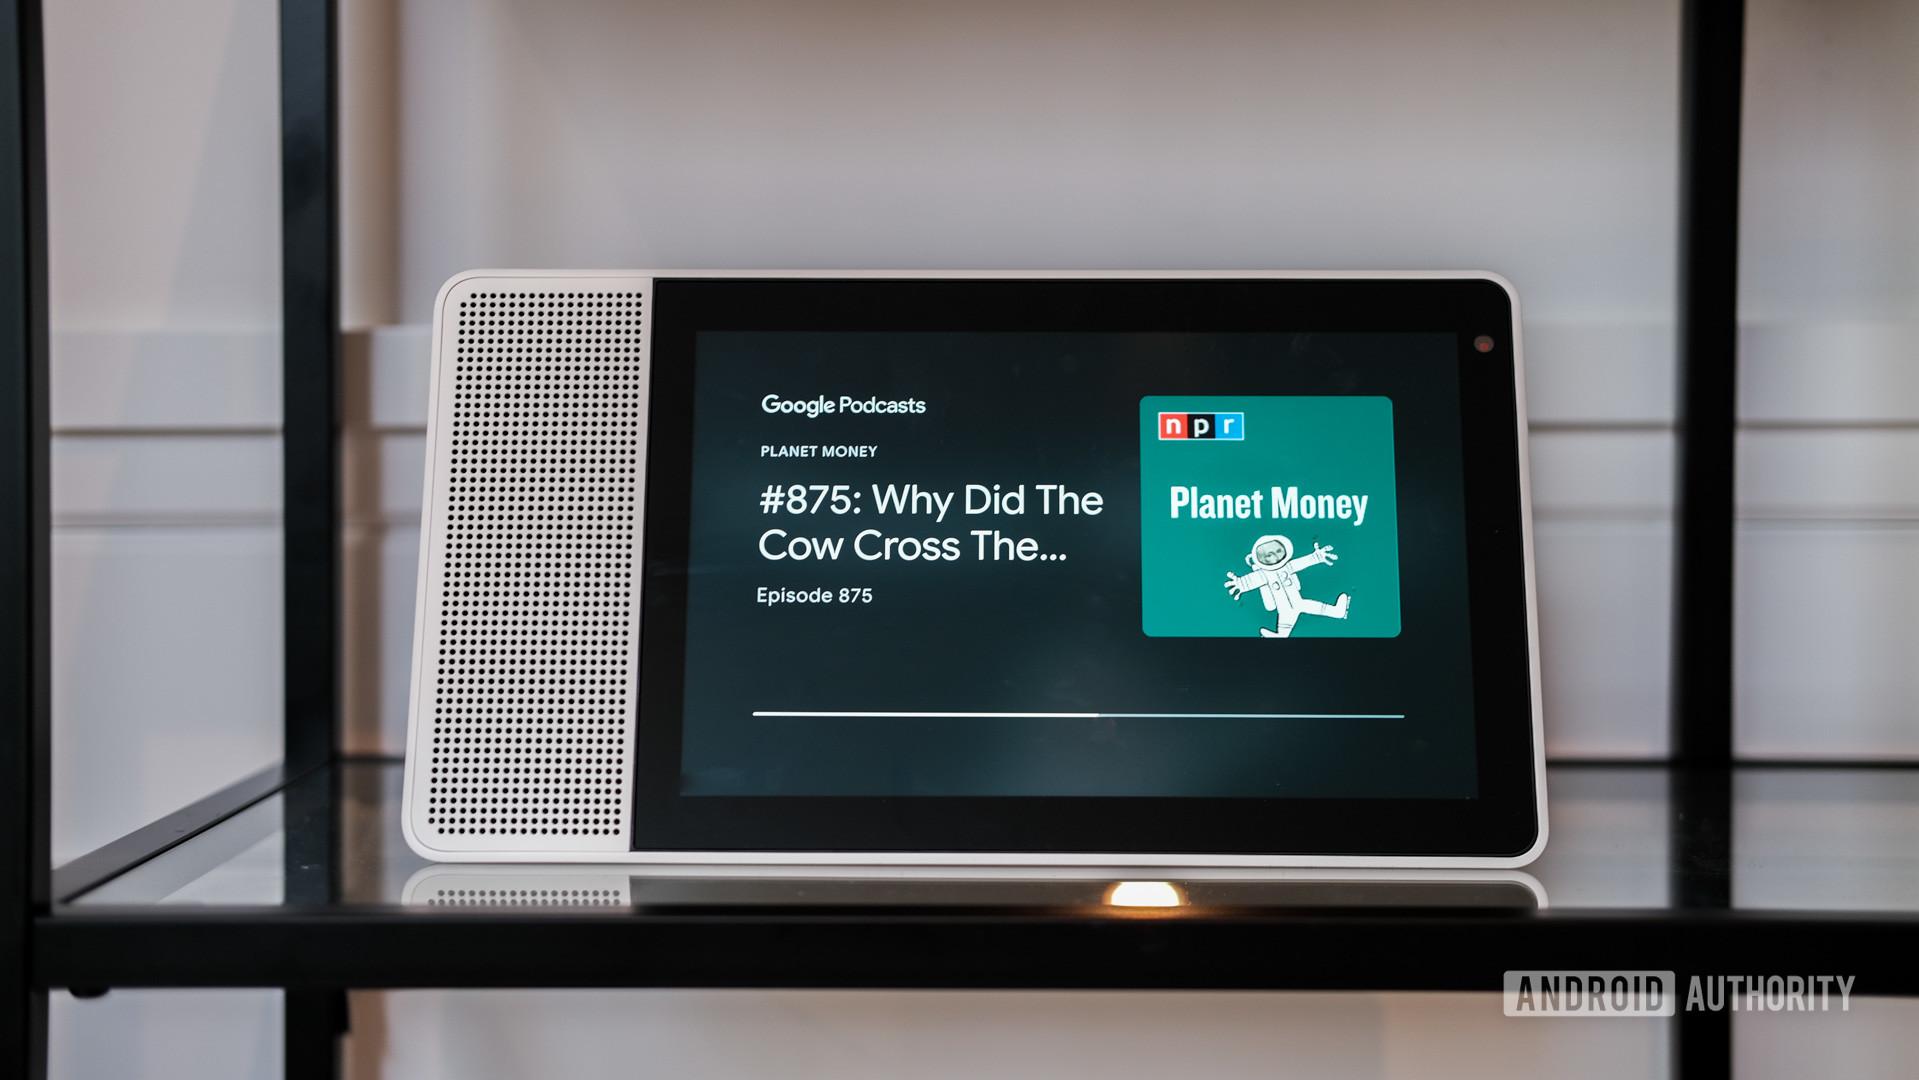 Lenovo Smart Display Podcasts